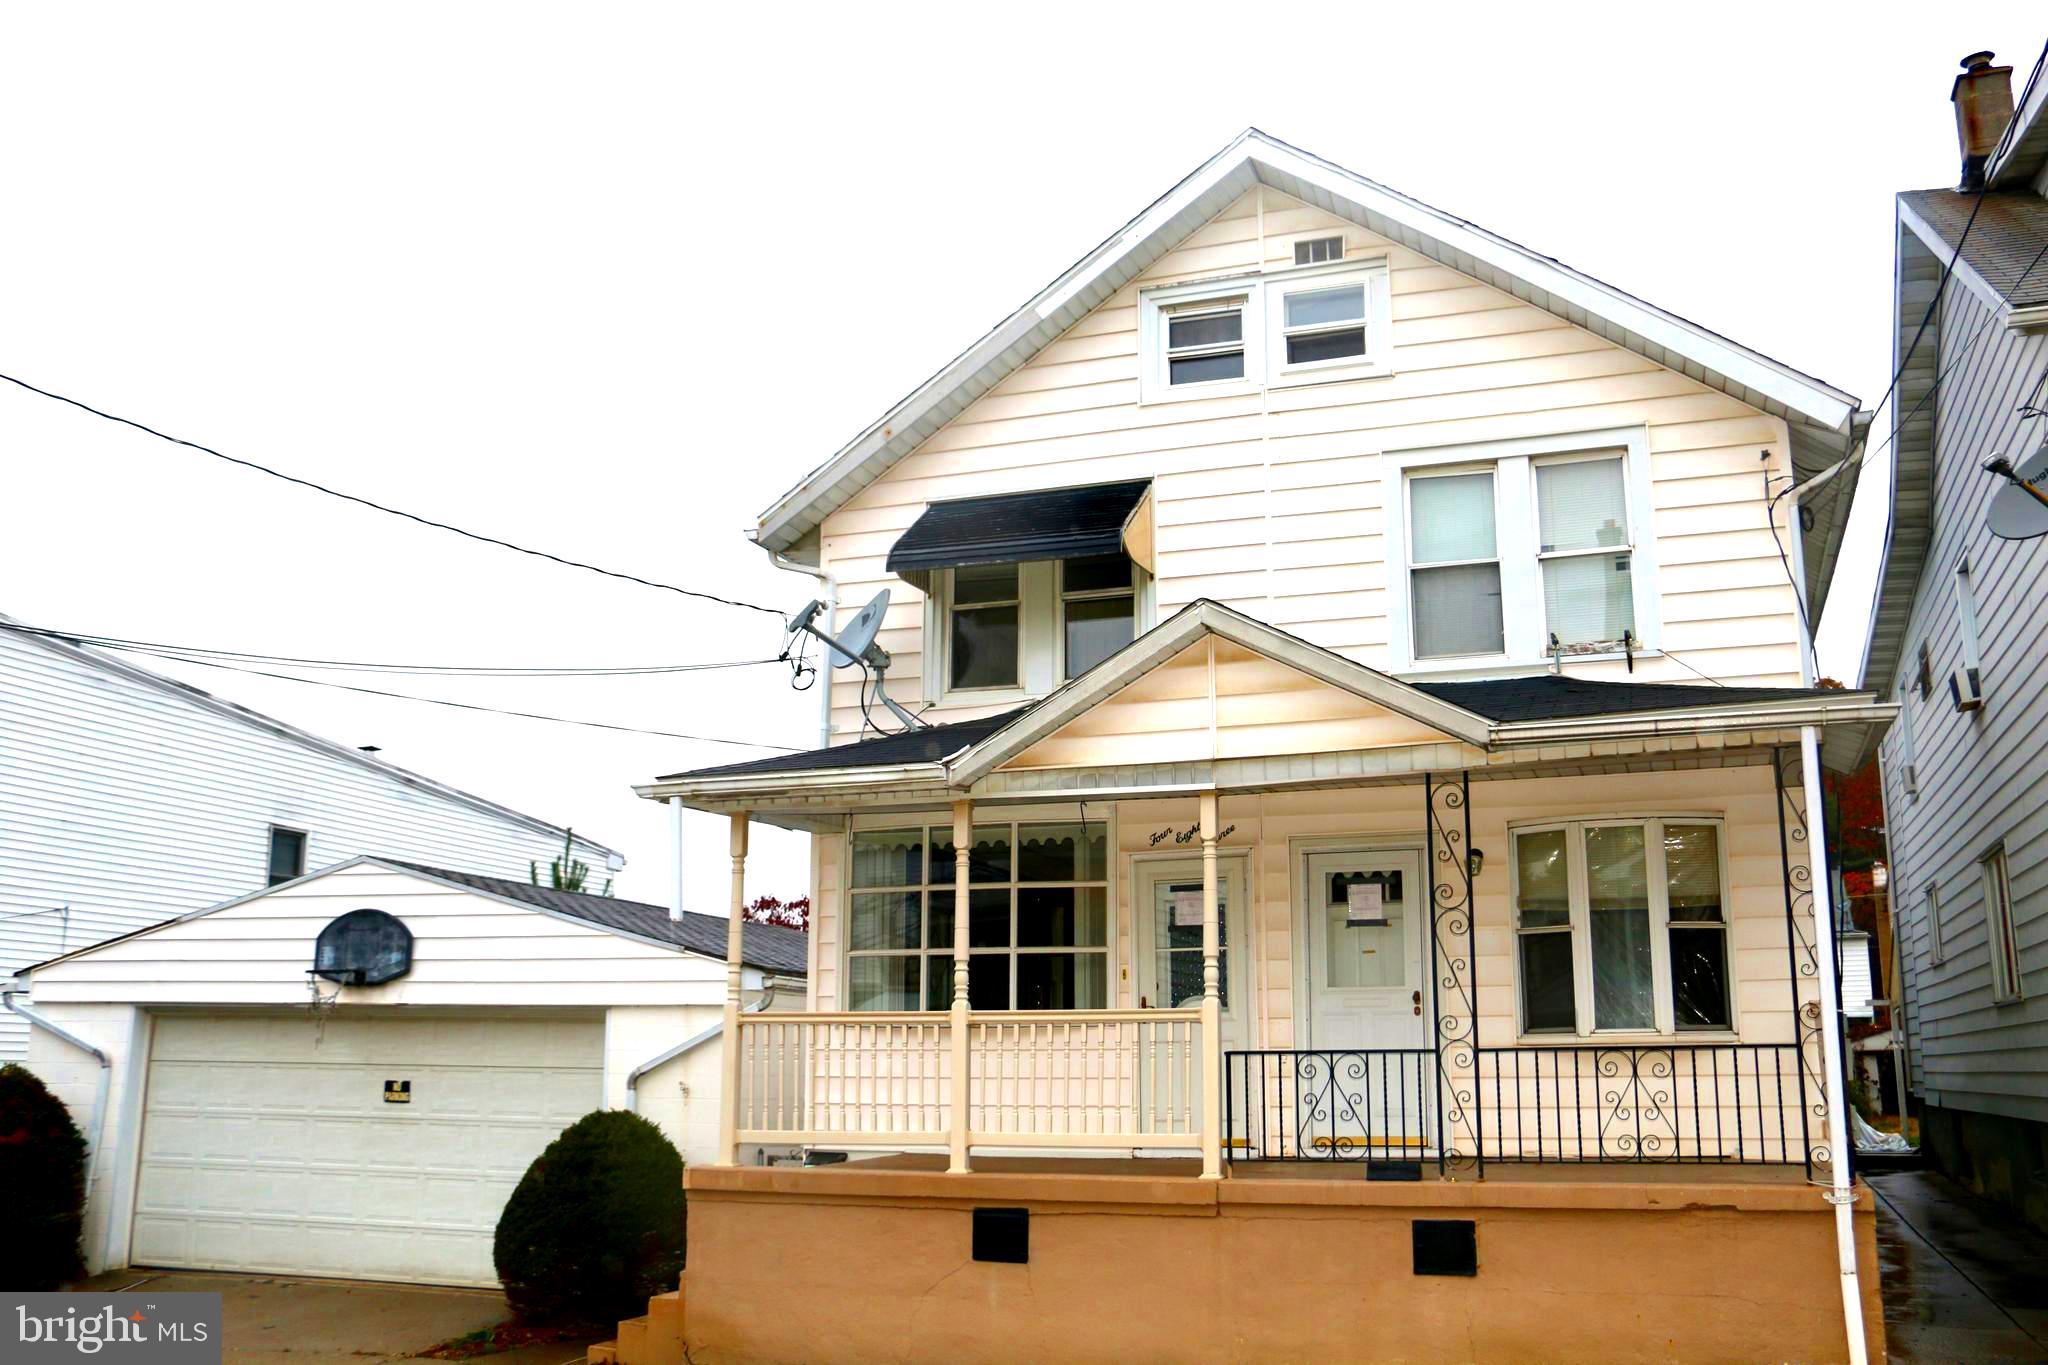 483 W SAYLOR STREET, MOUNT CARMEL, PA 17851